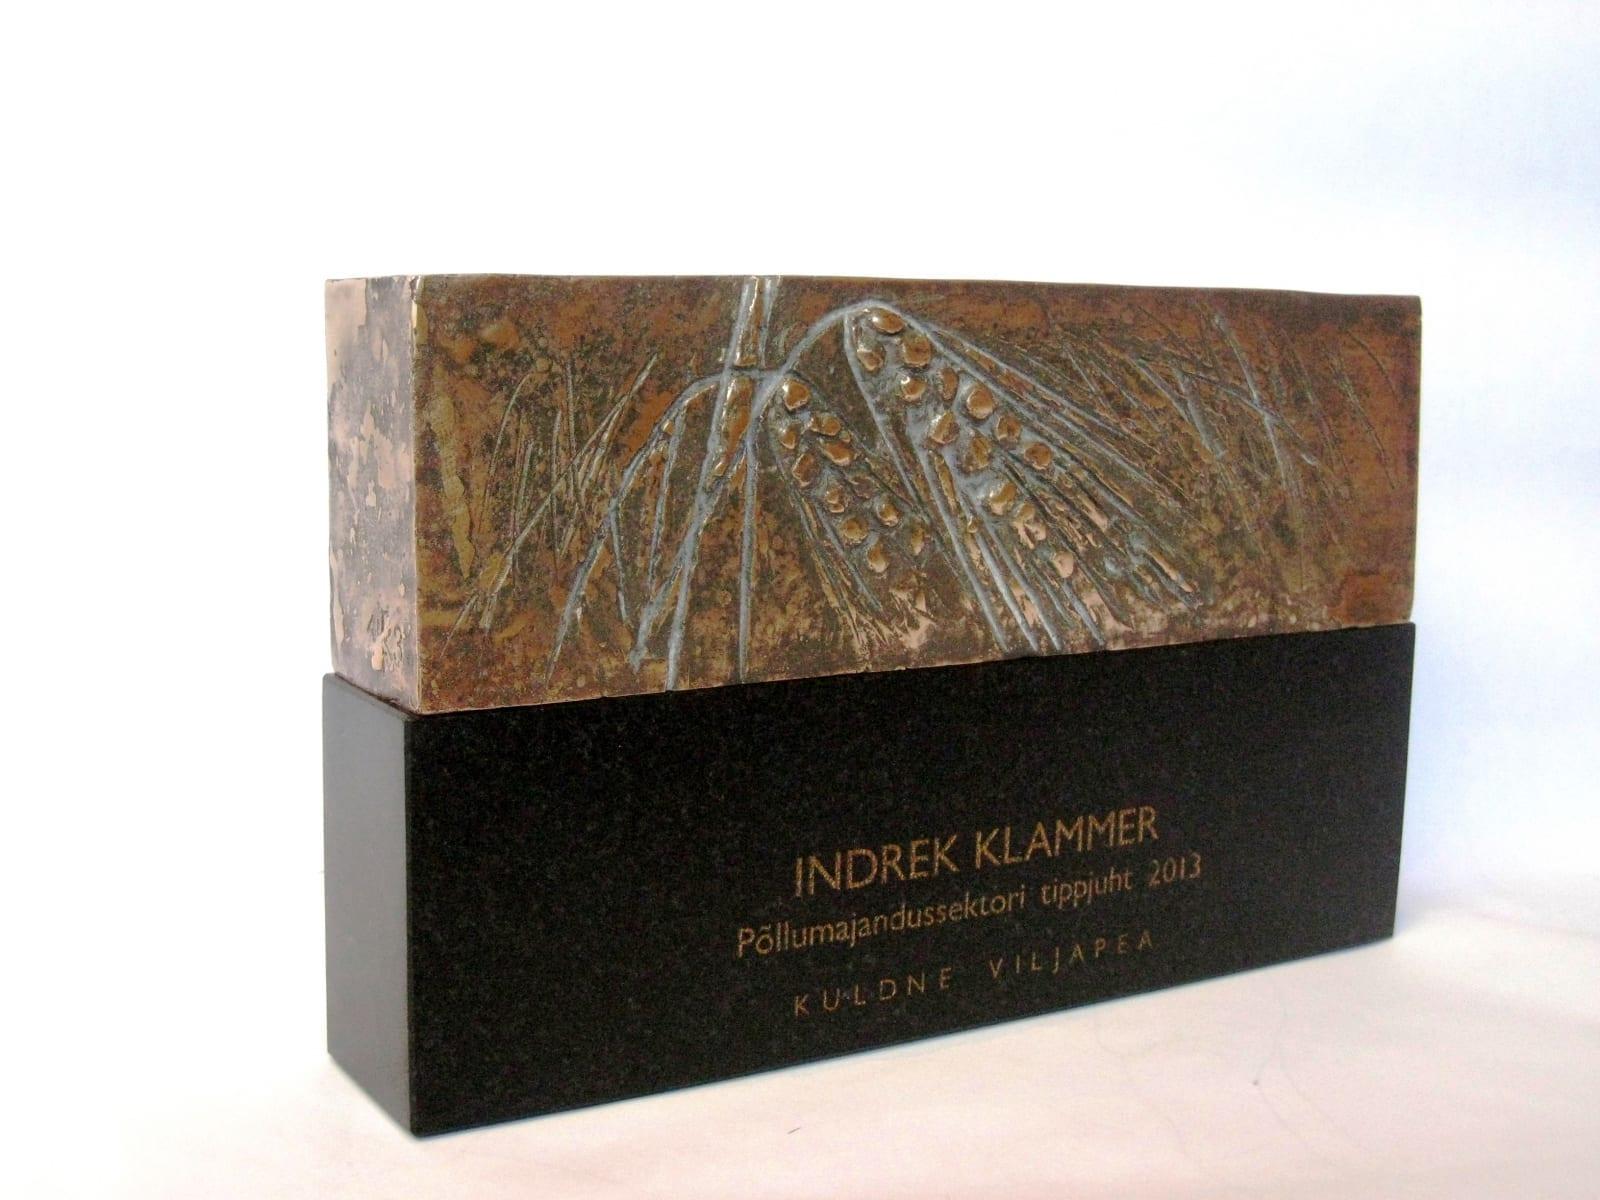 Auhind PÕLLUMAJANDUSSEKTORI TIPPJUHT 2013 - .... graniit, pronks  <br/>An award to a TOP LEADER of AGRICULTURE 2013 - ... granit, bronze